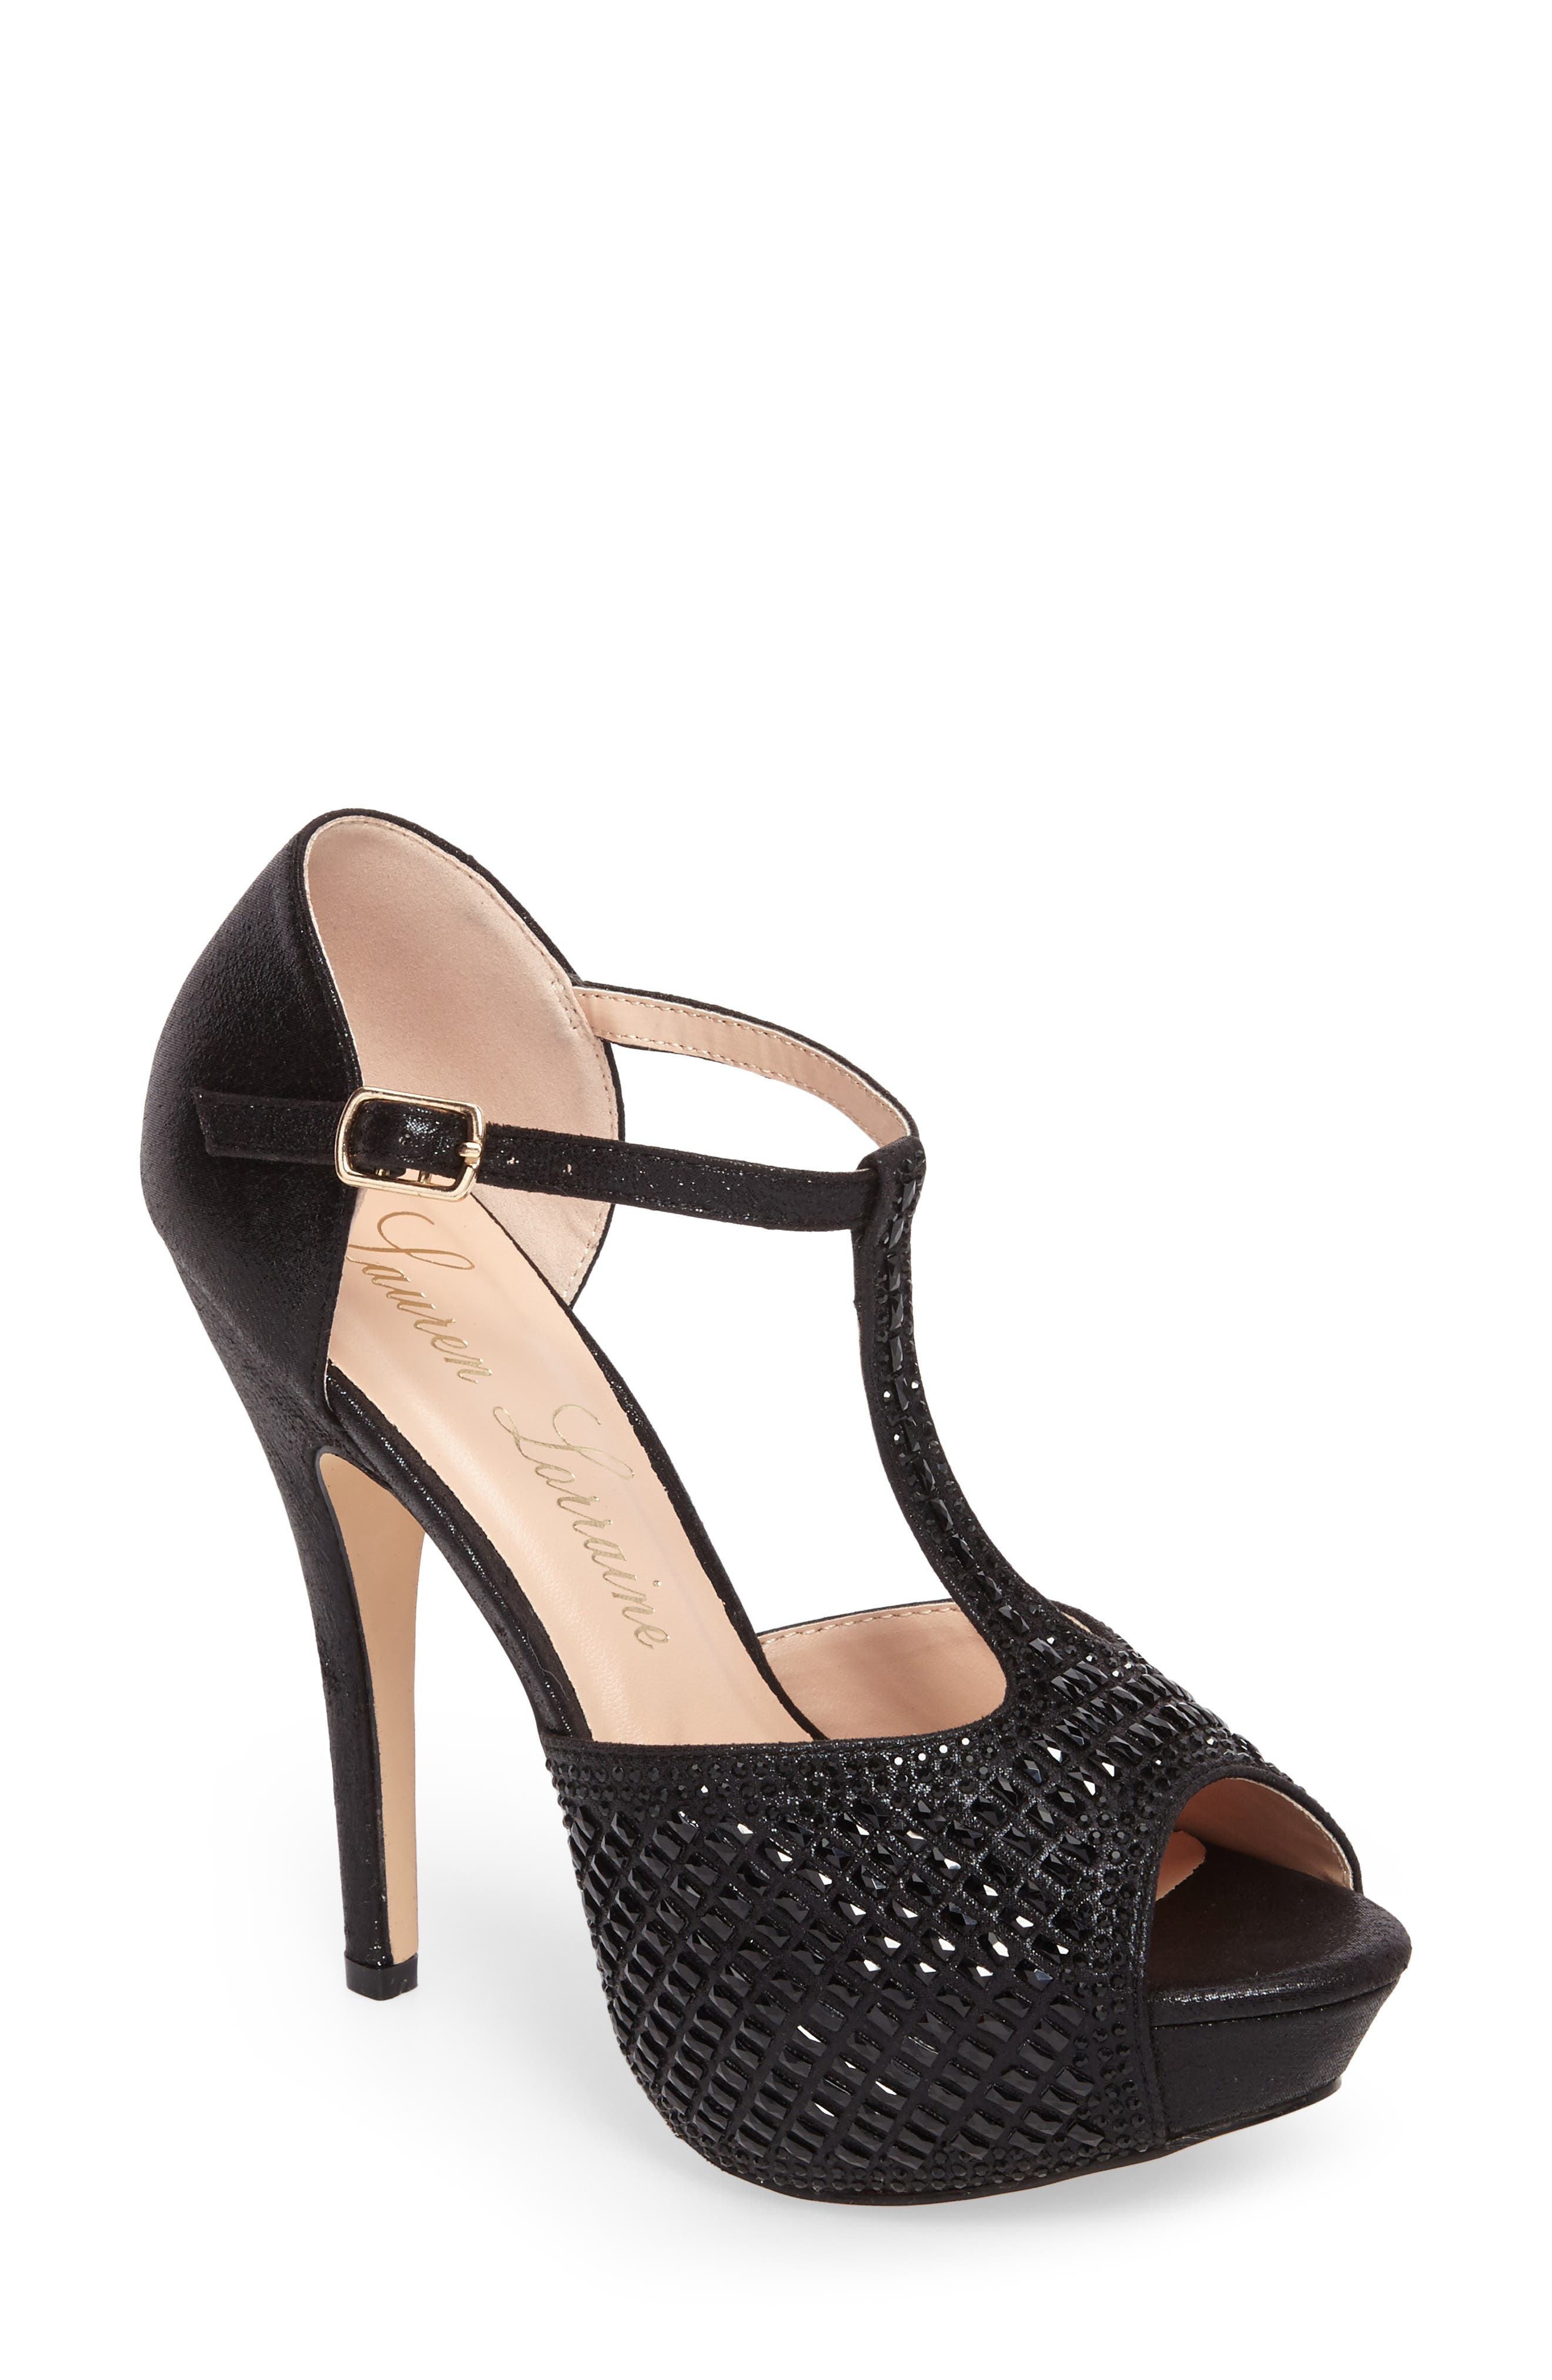 Lauren Lorraine Vivian 4 Crystal Embellished Sandal (Women)